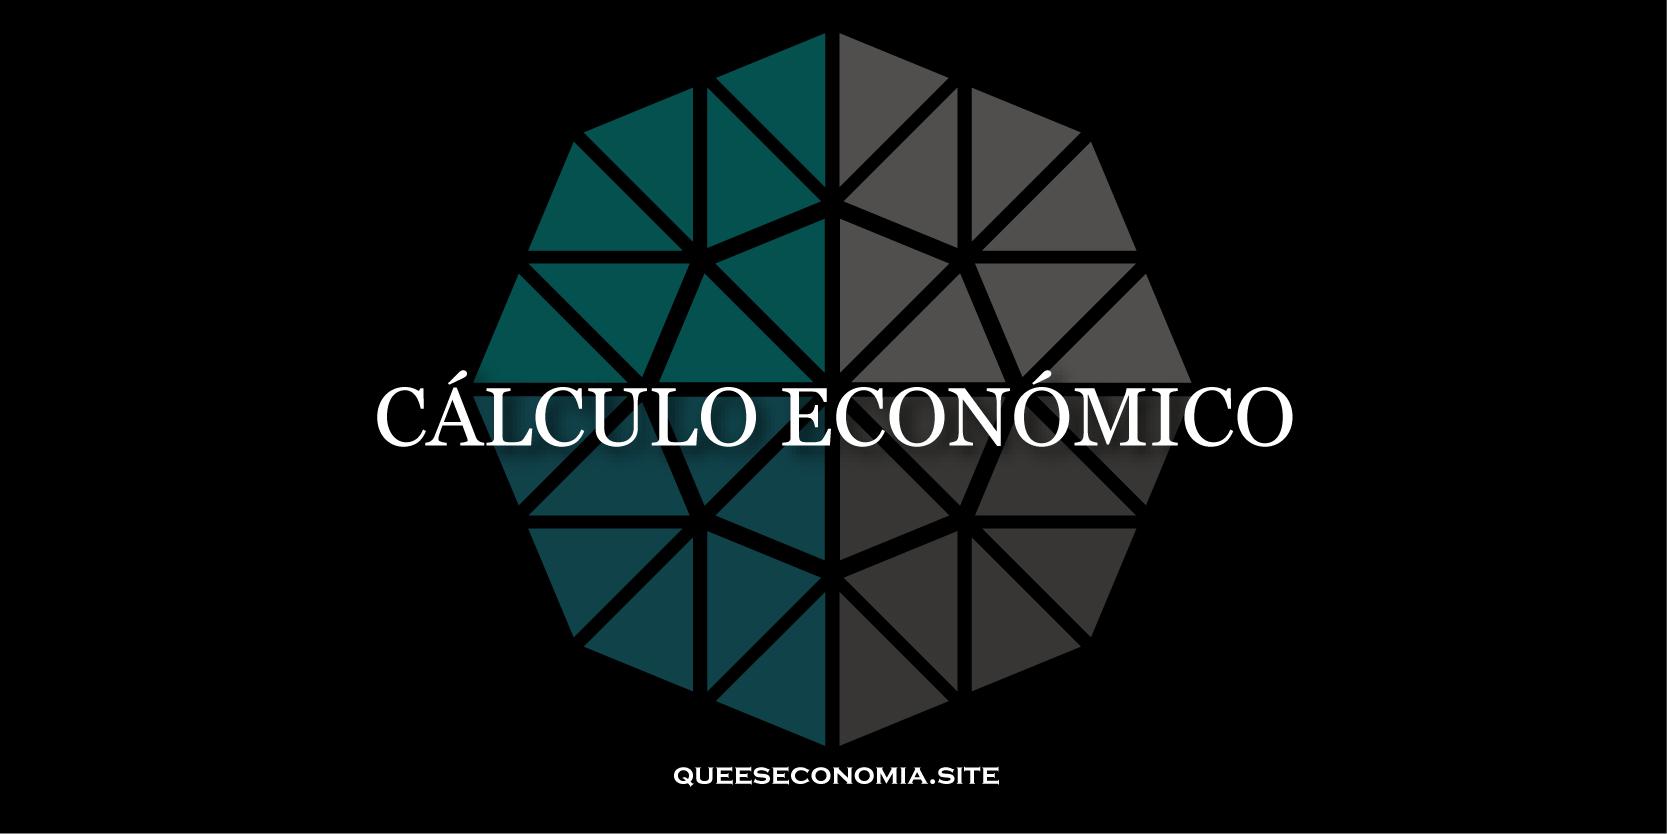 cálculo económico